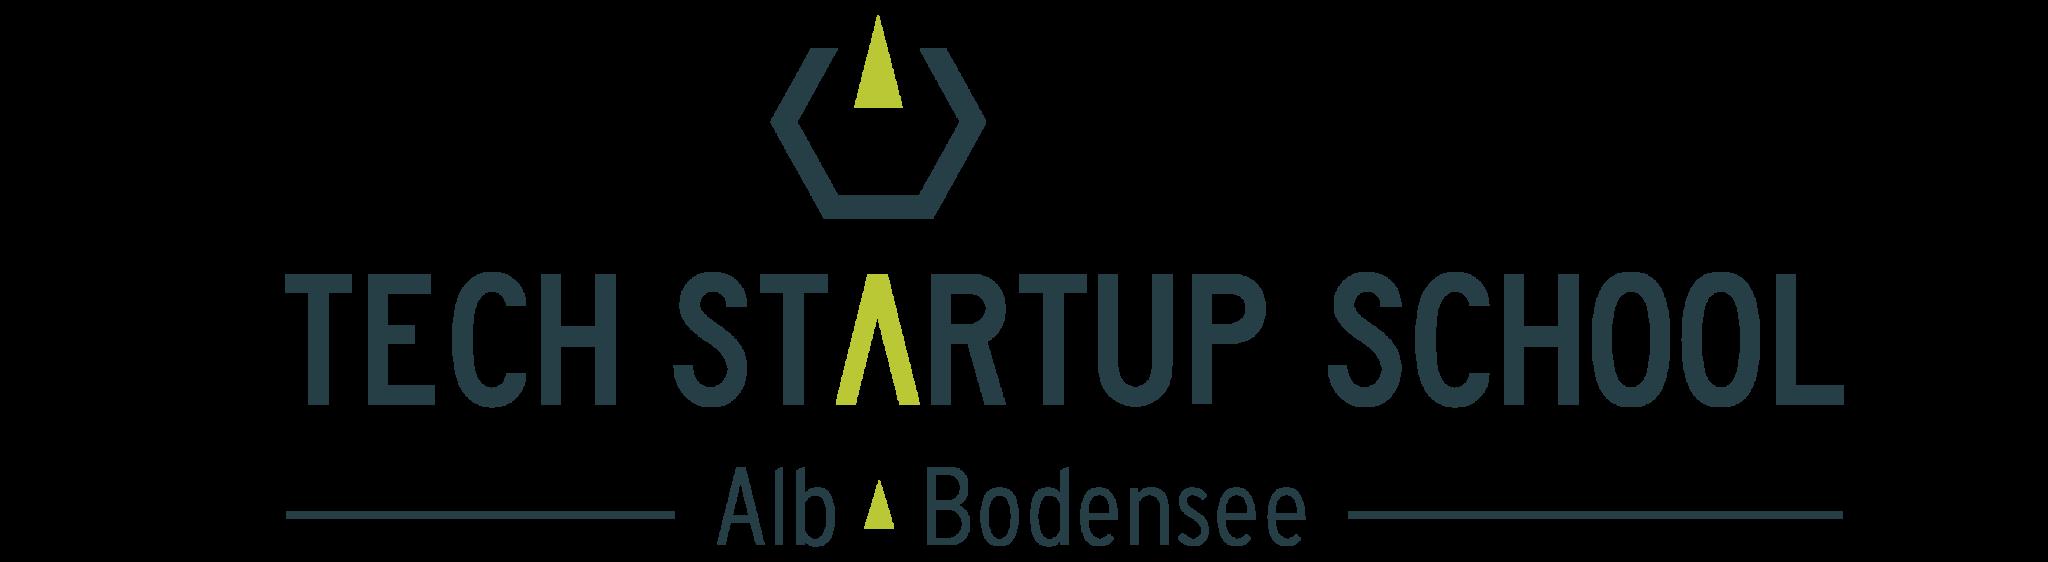 https://tech-startup-school.de/